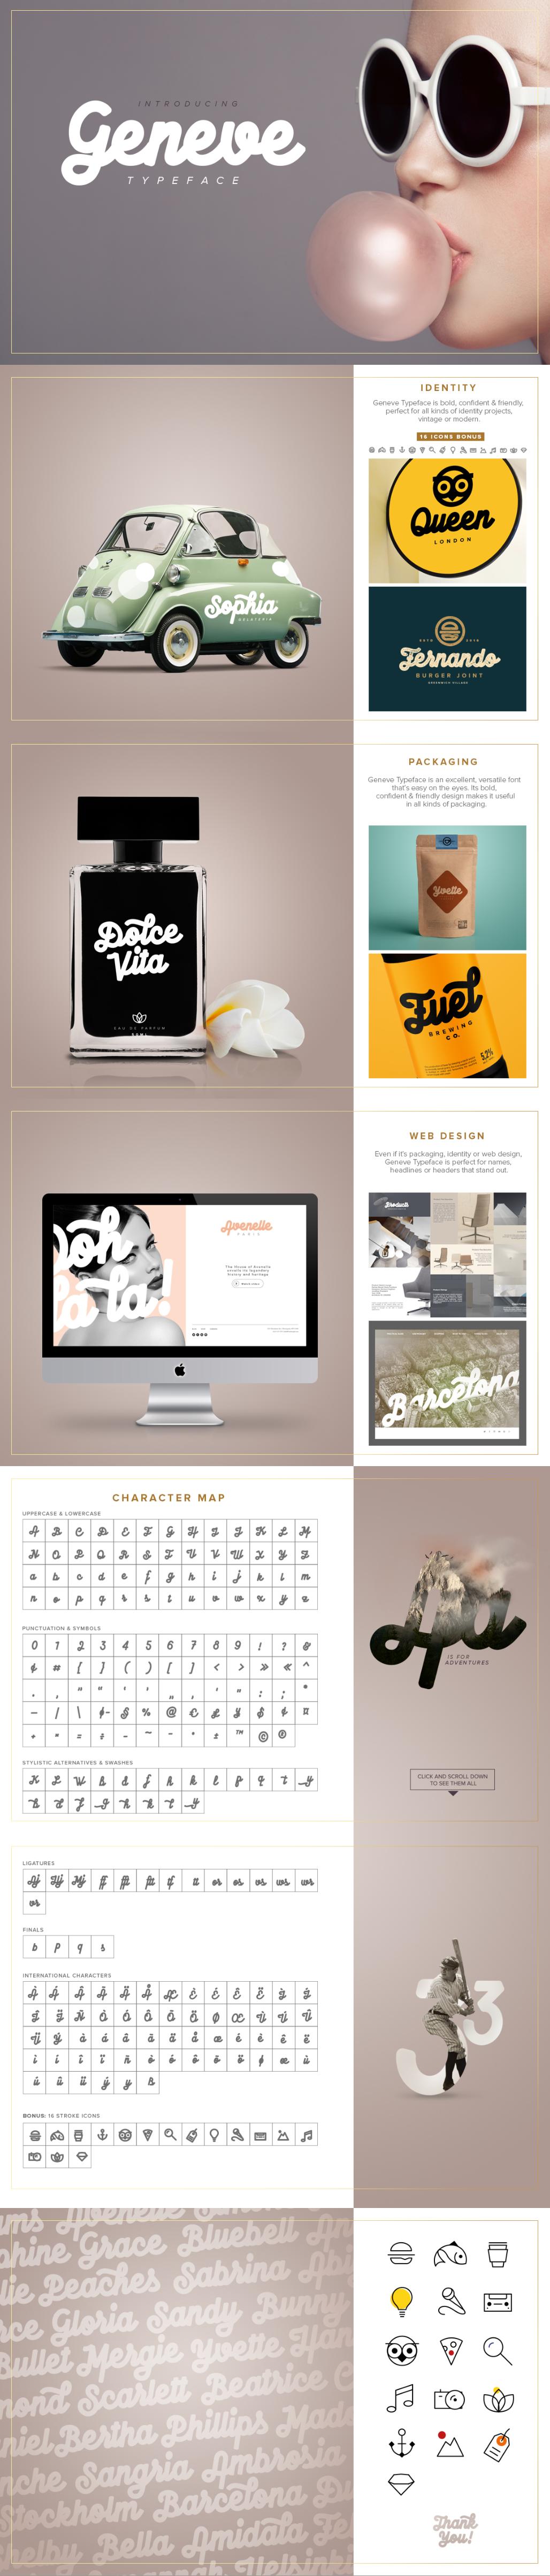 geneve-typeface